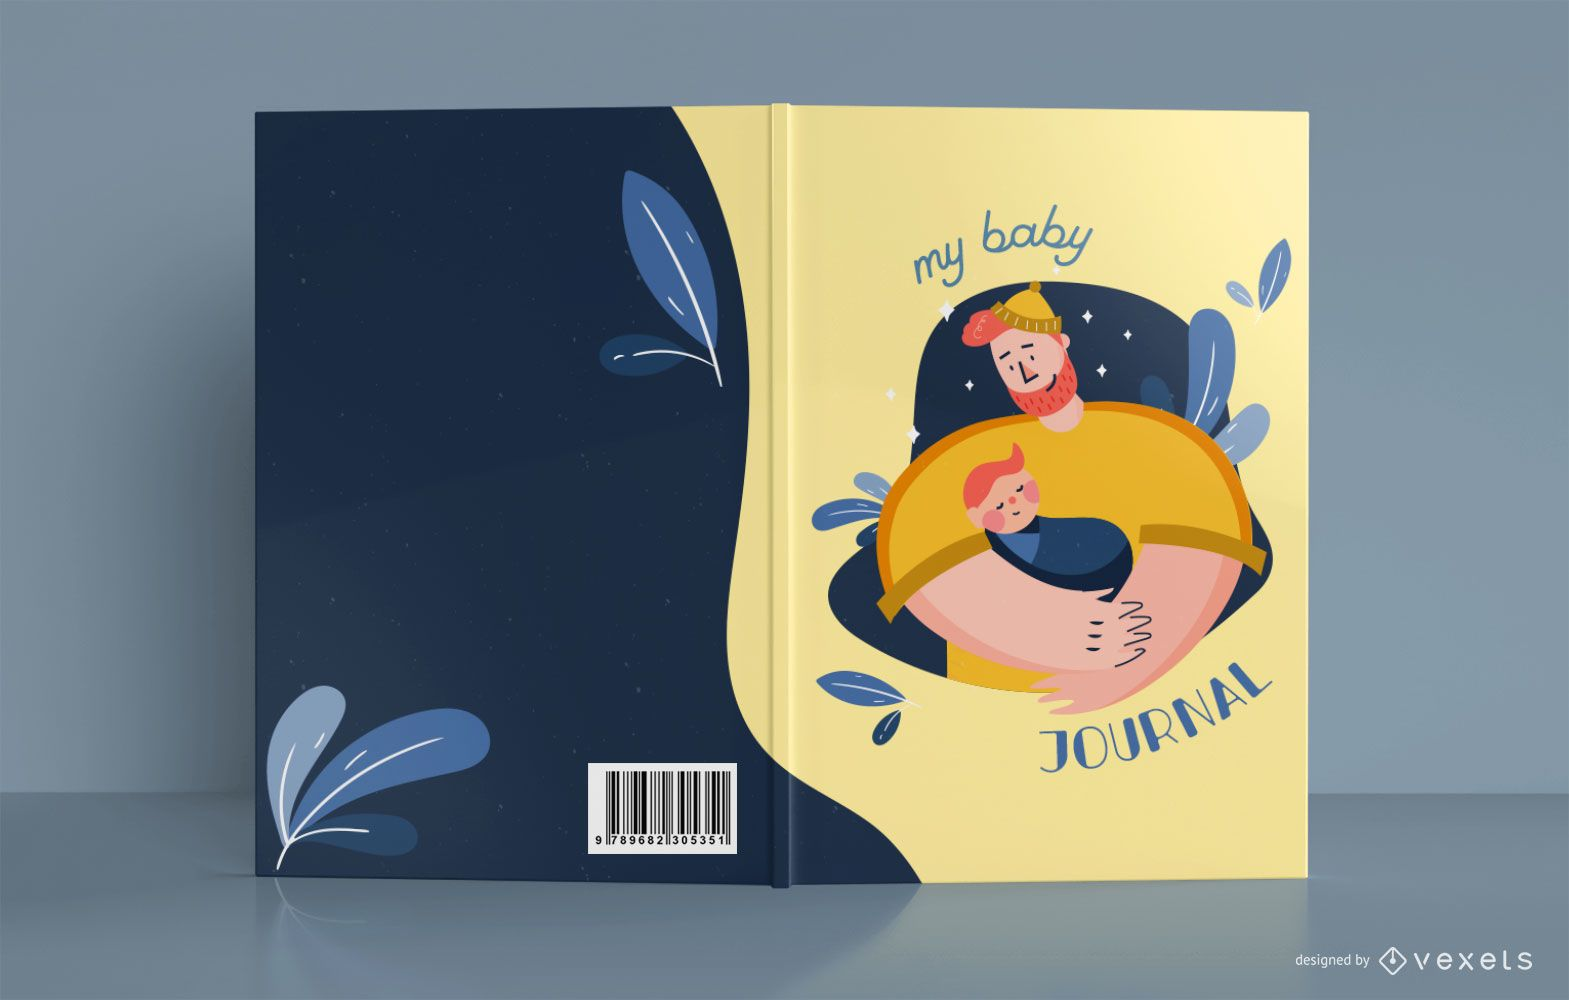 Mein Baby Journal Vater Buch Cover Design